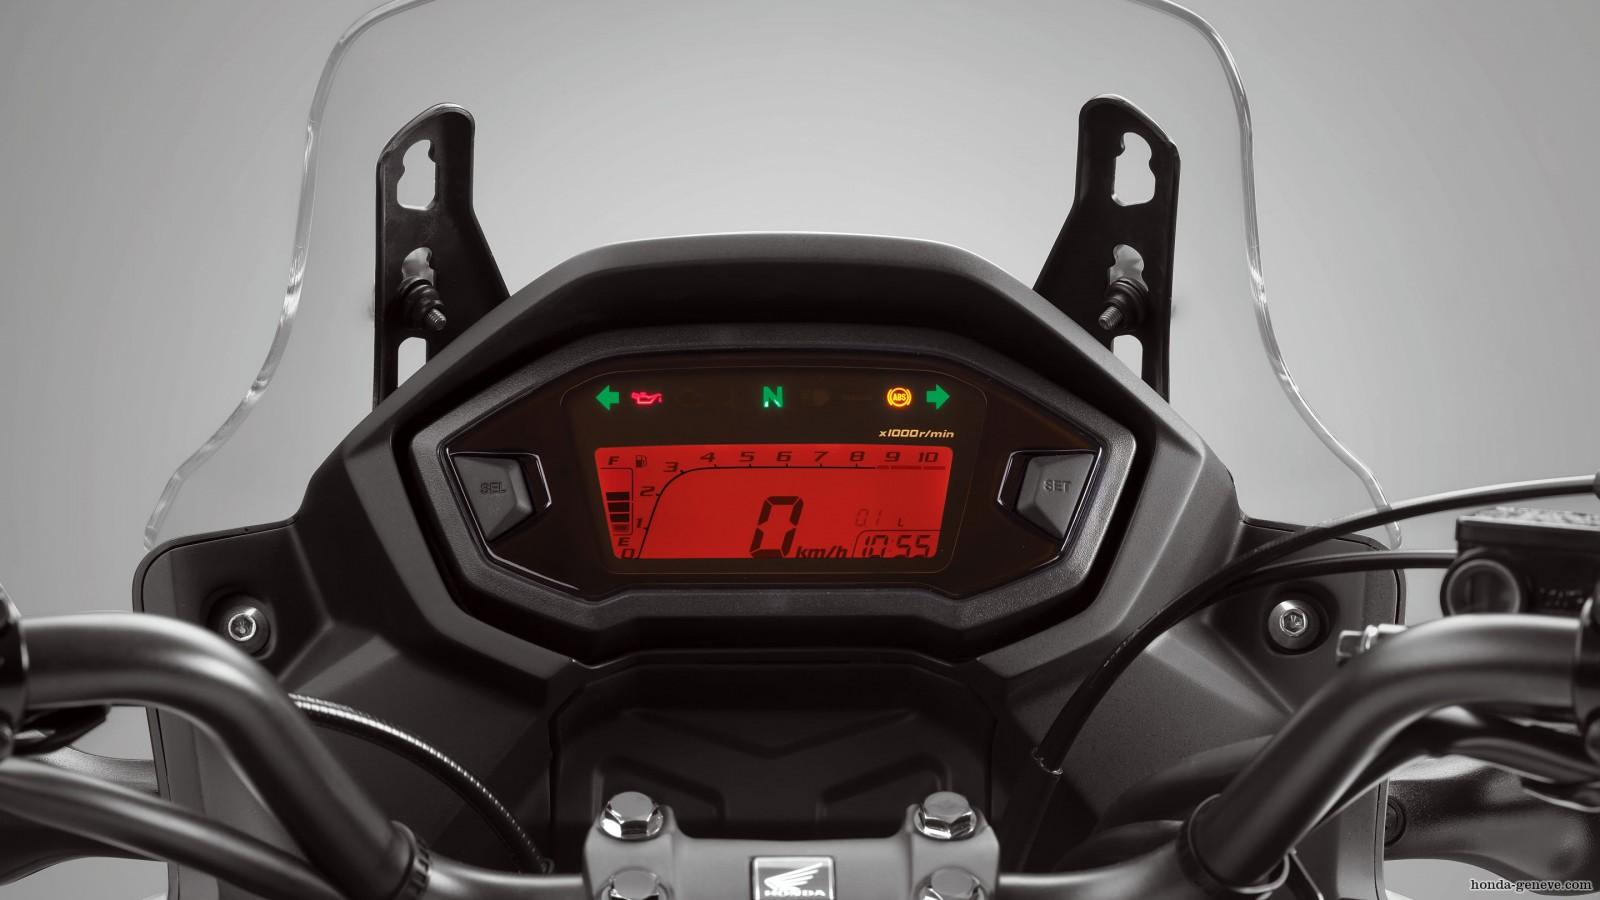 2018 Honda CB500X instrument display panel.